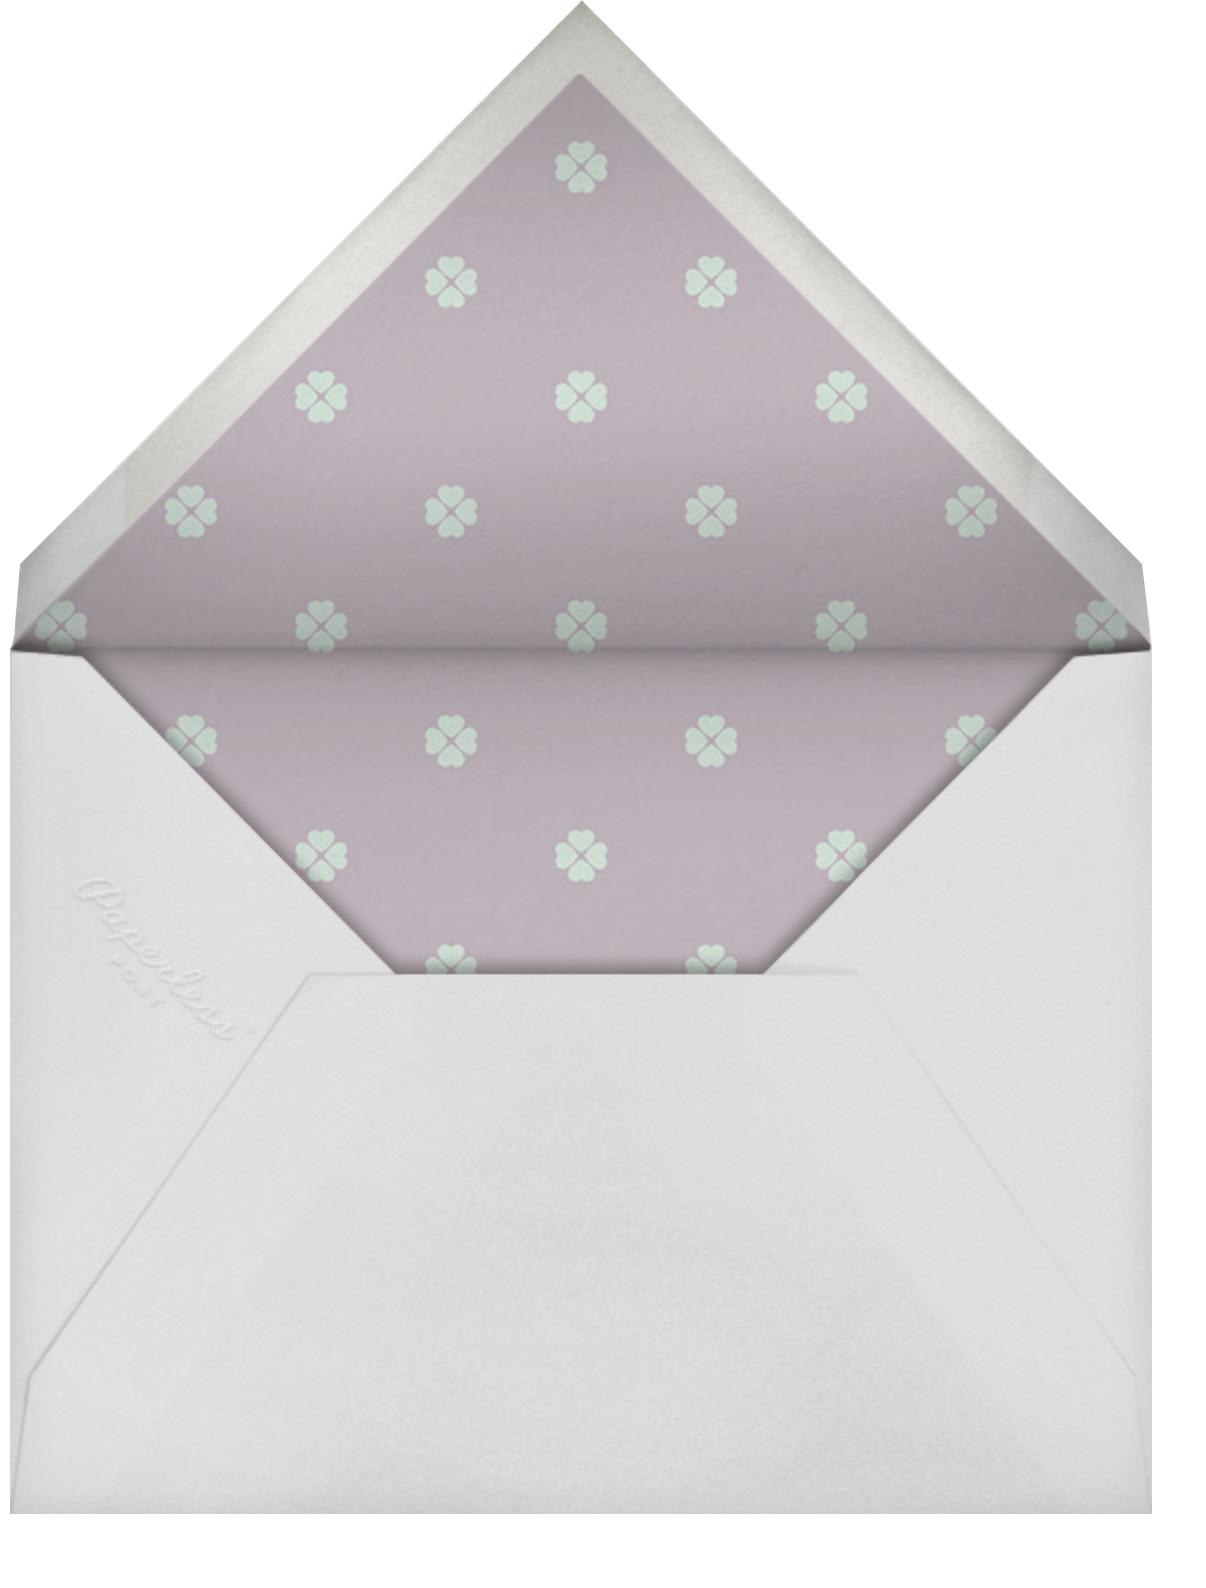 Rosy Dreams - Pistachio - kate spade new york - Envelope